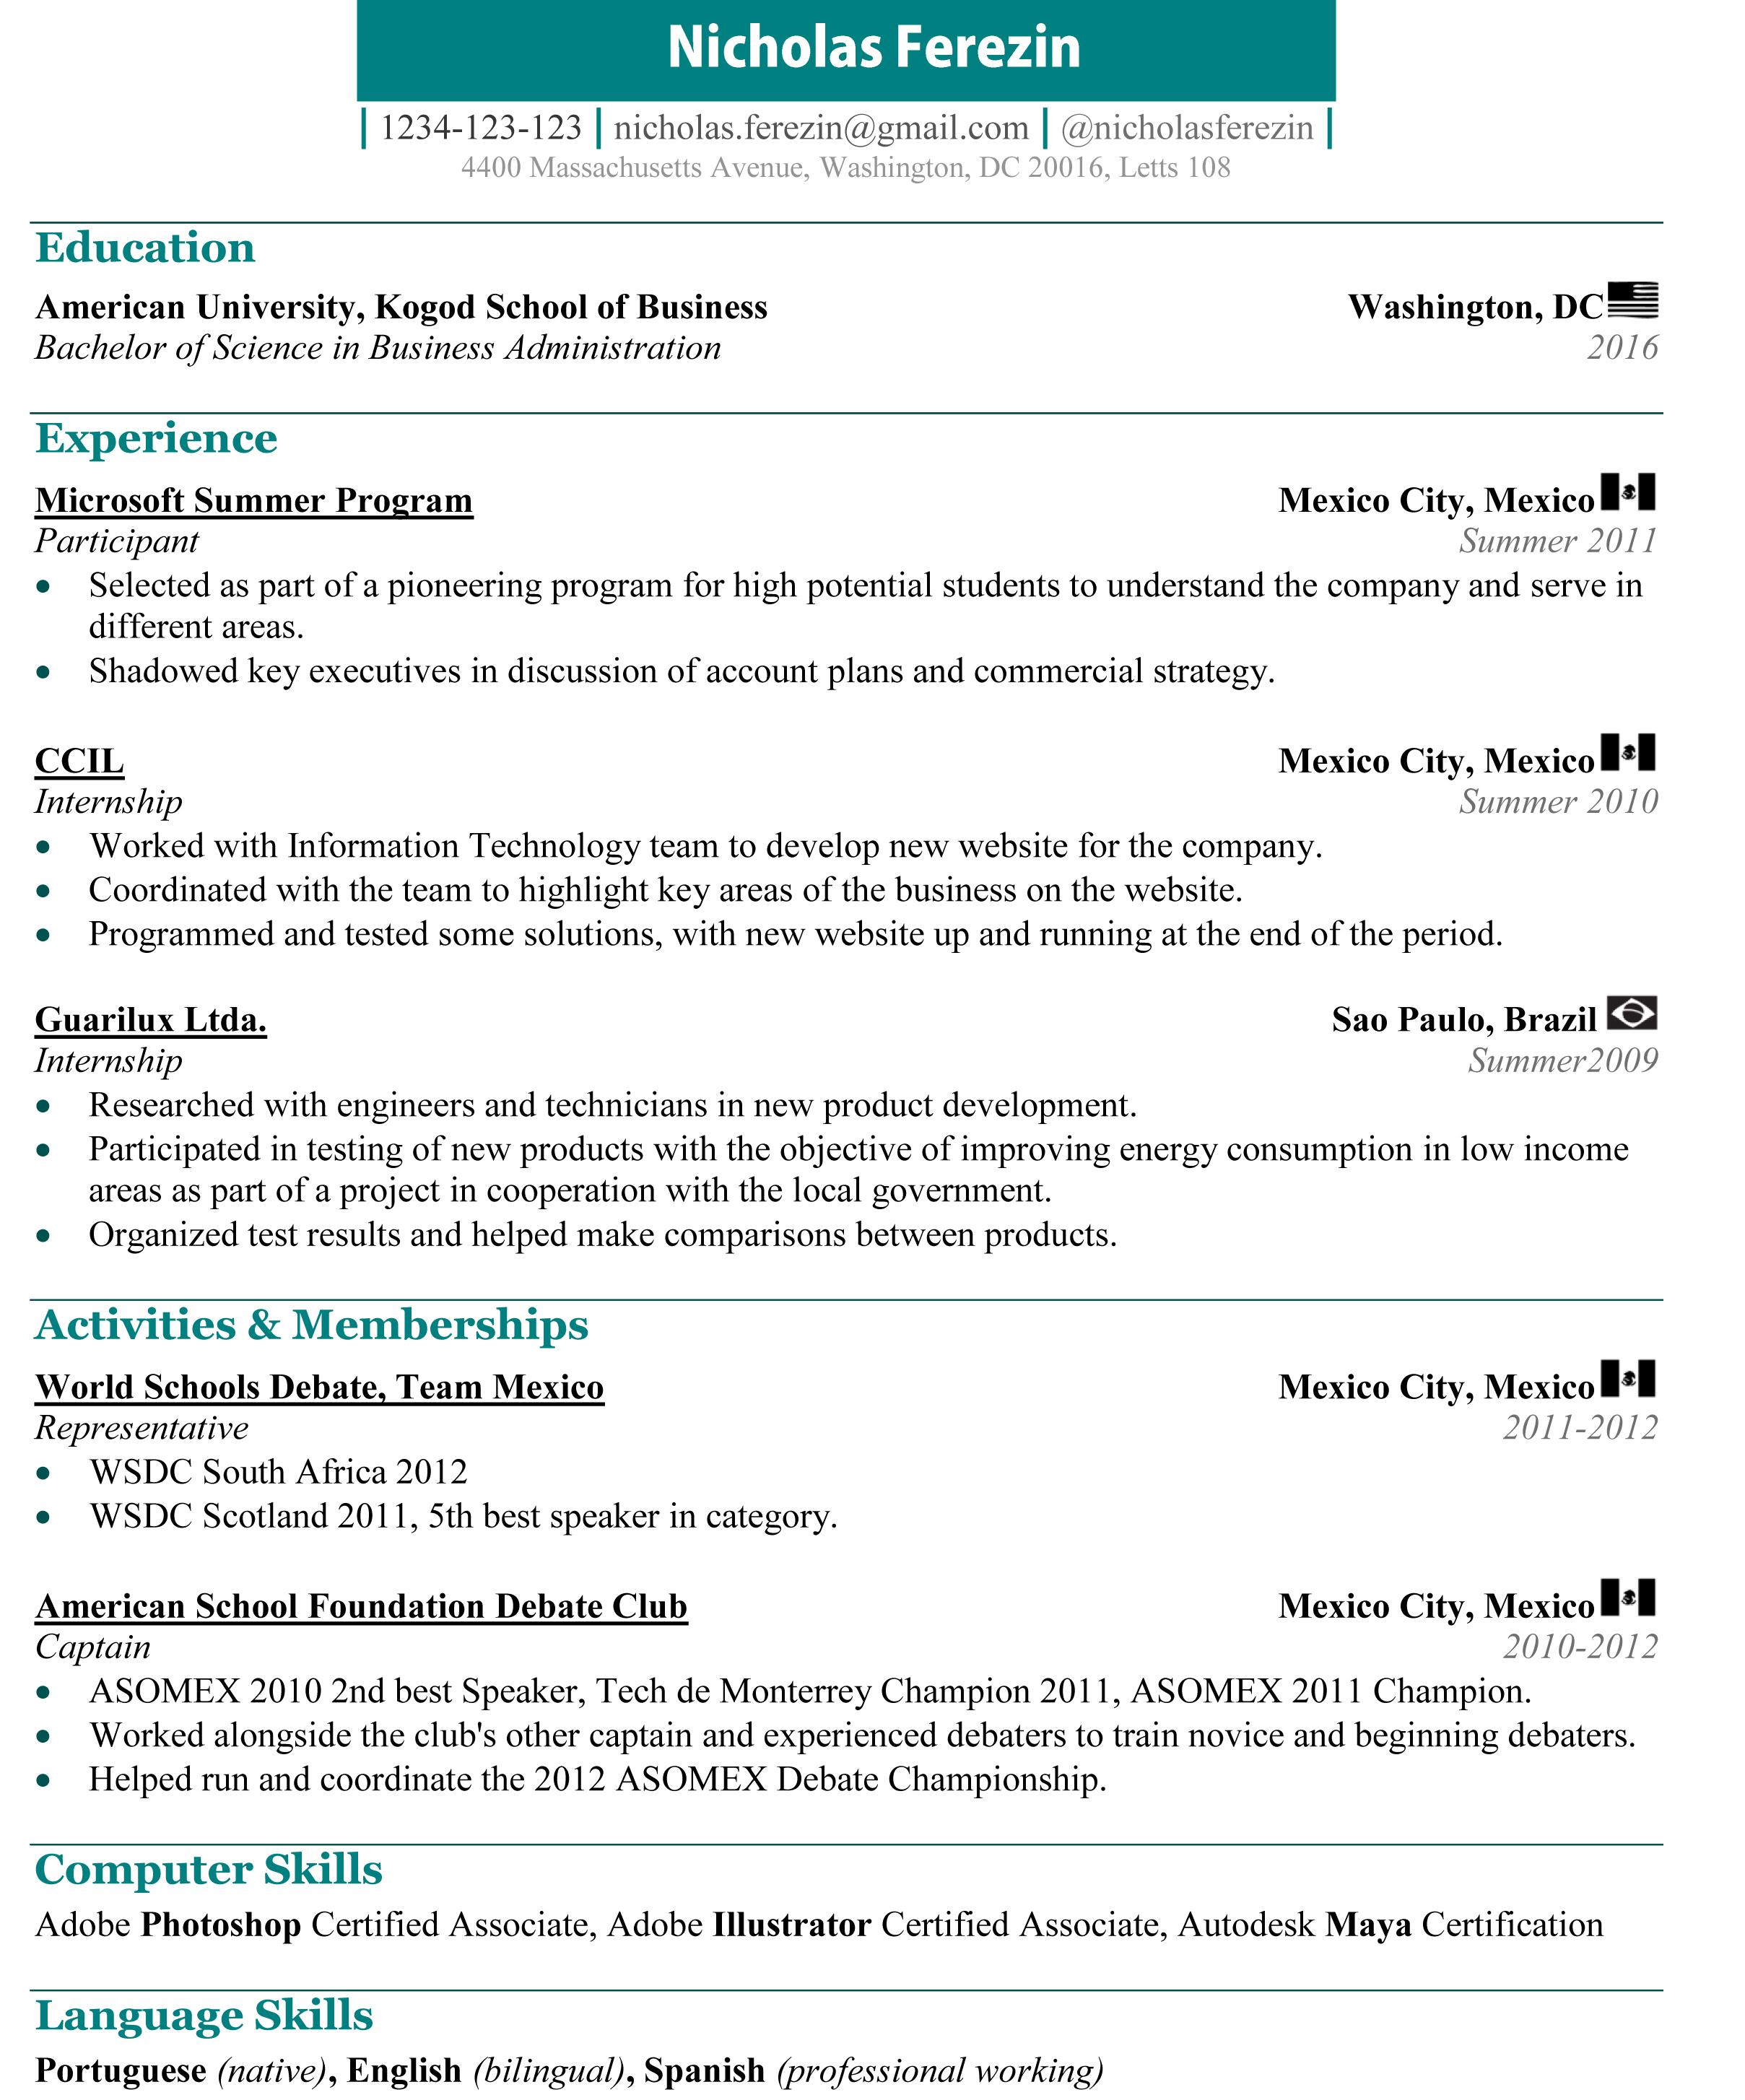 resume stationery and business card nicholas ferezin